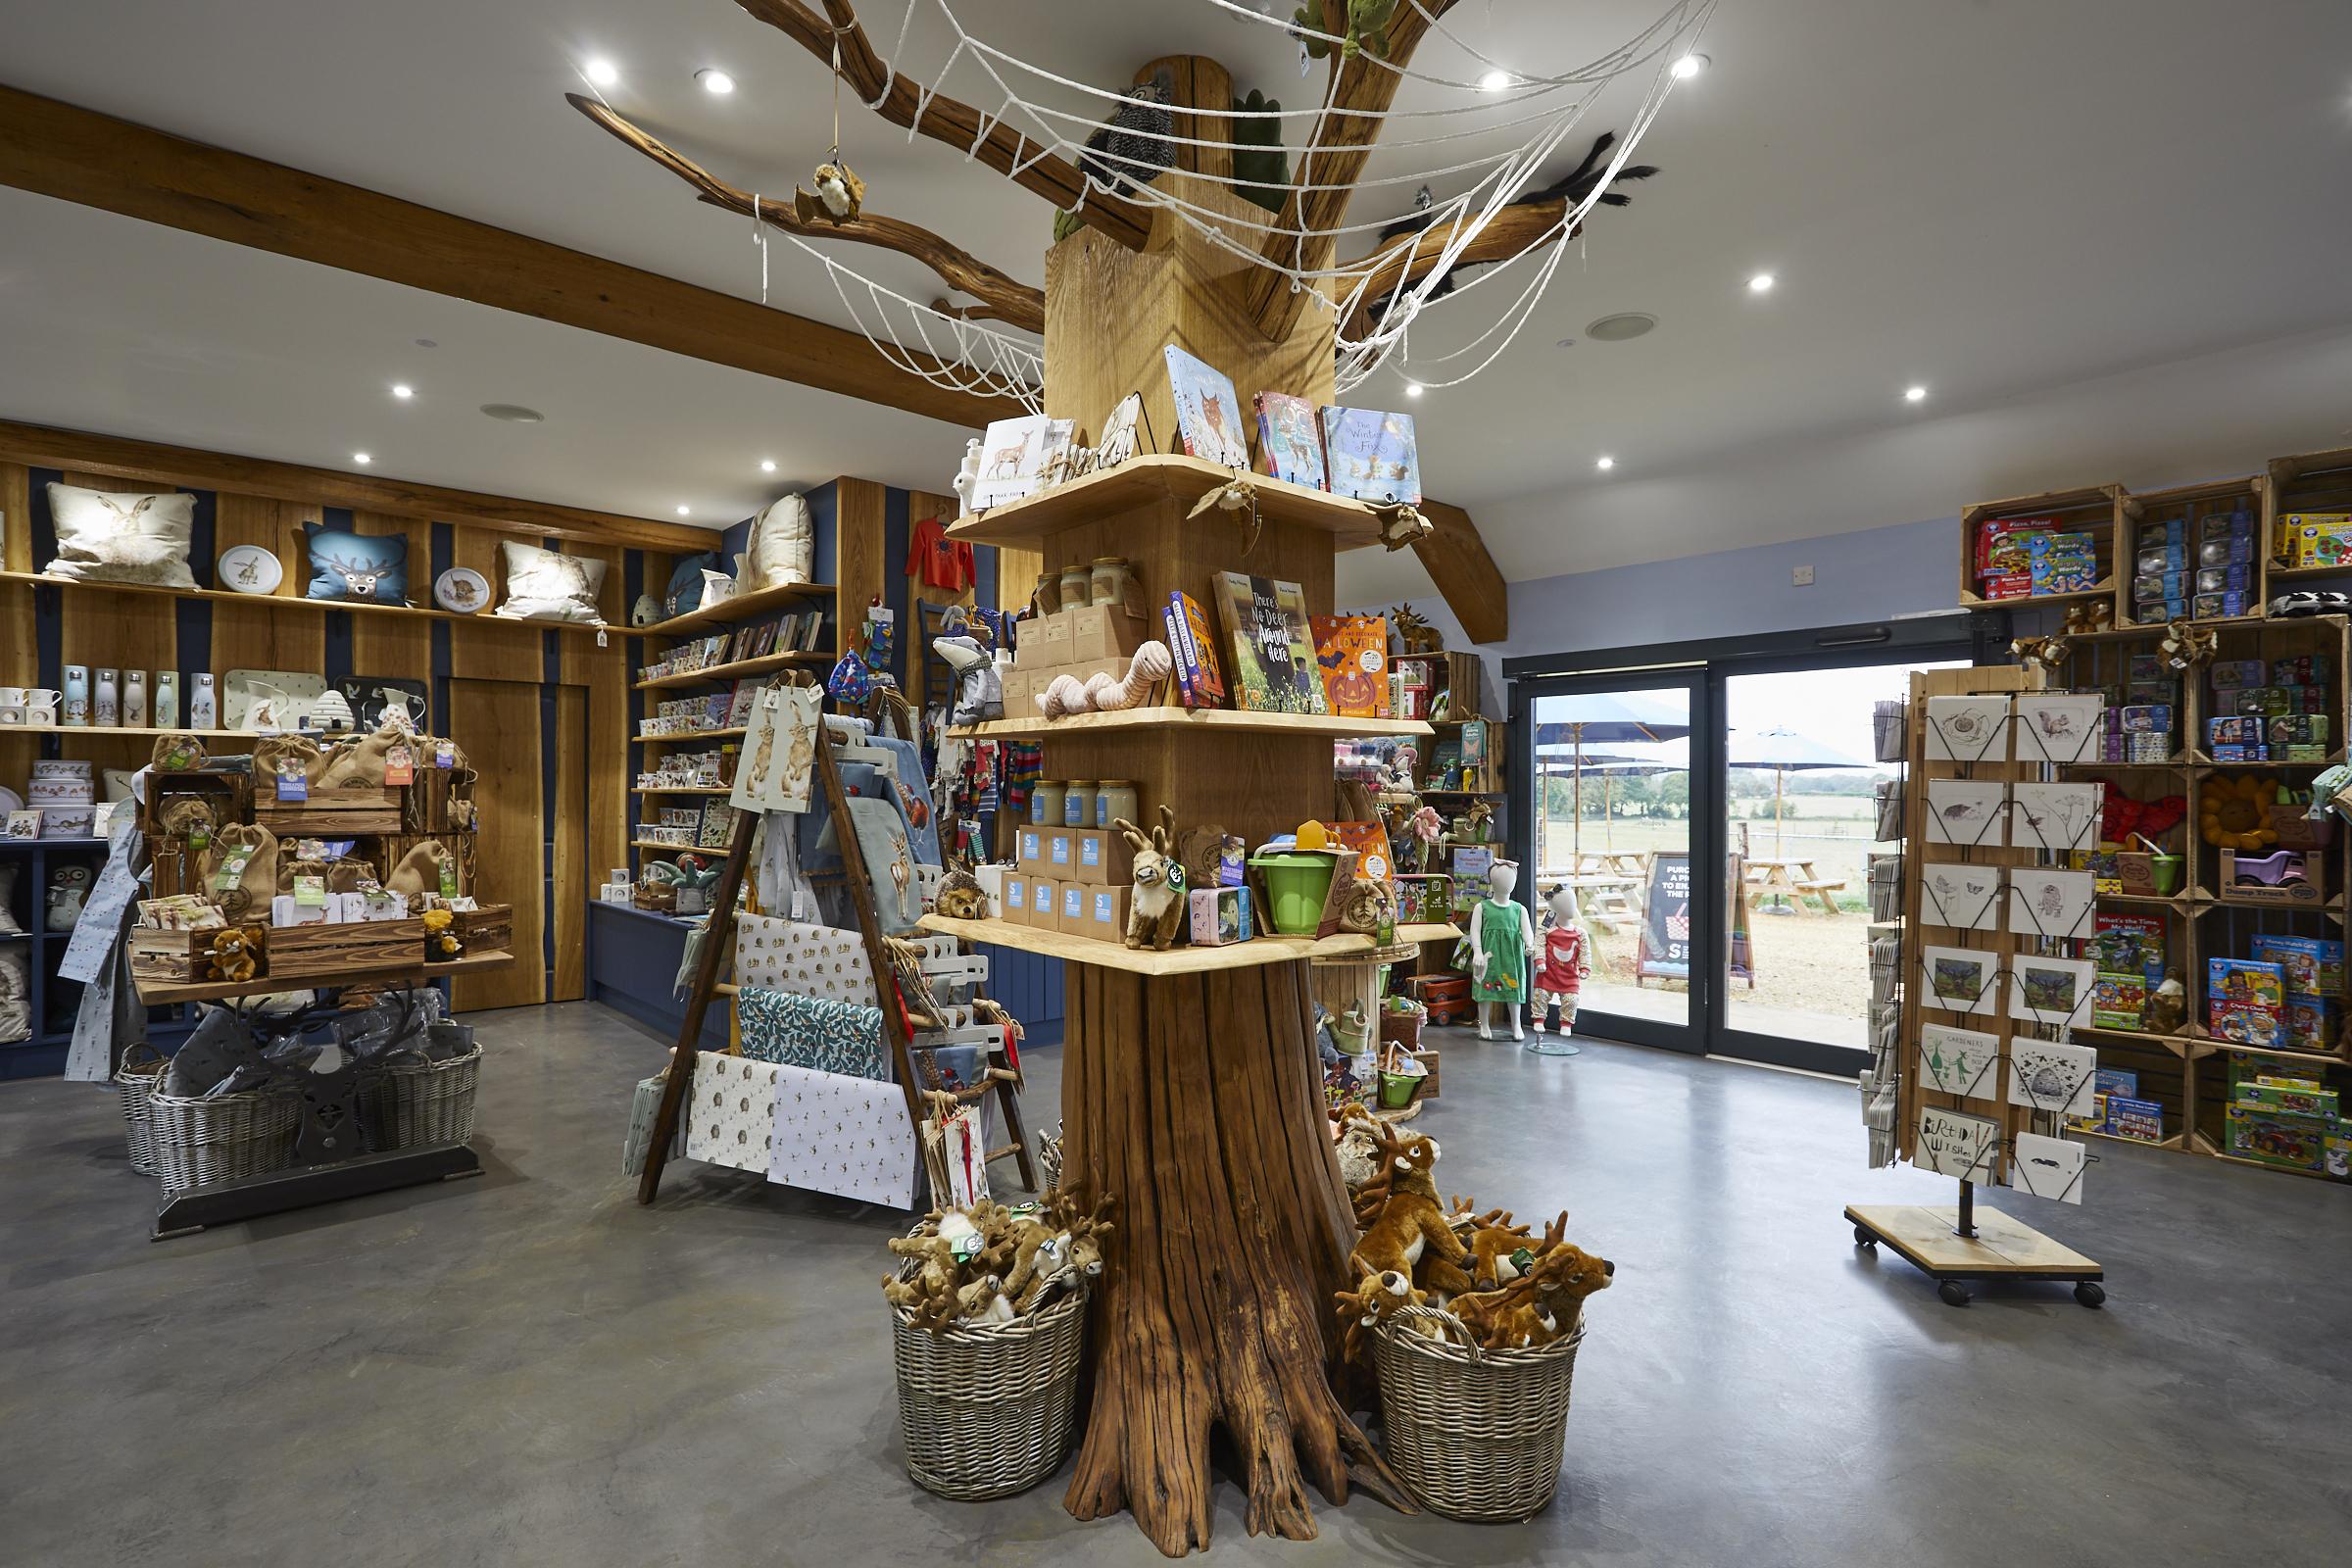 Visitor Centre, Gift Shop at Sky Park Farm